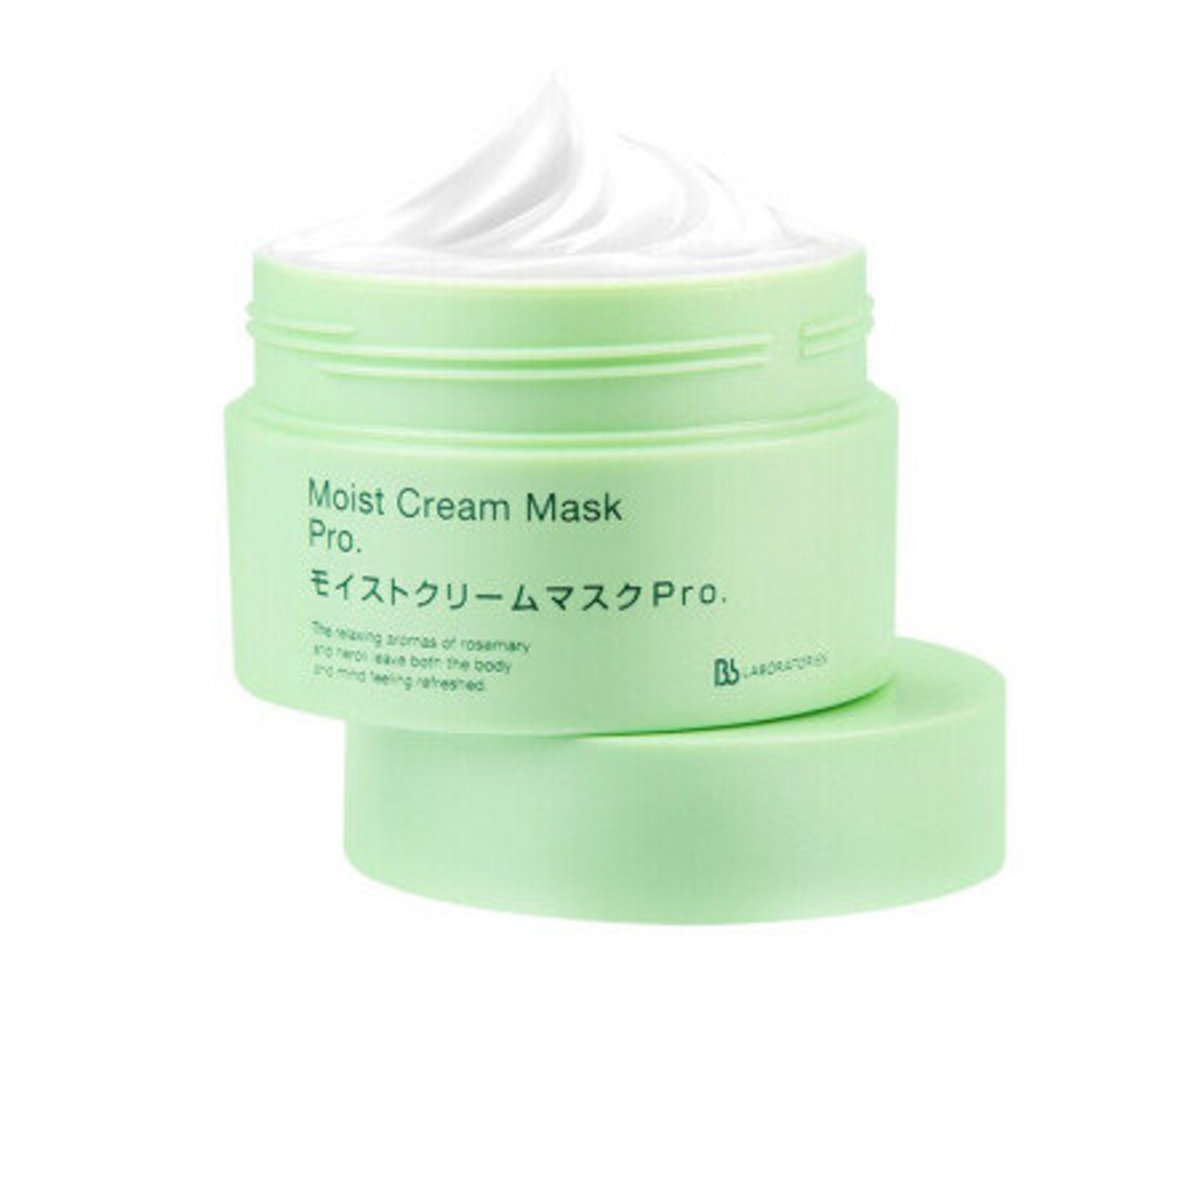 Moist Cream Mask Pro. 175g(Parallel Import)